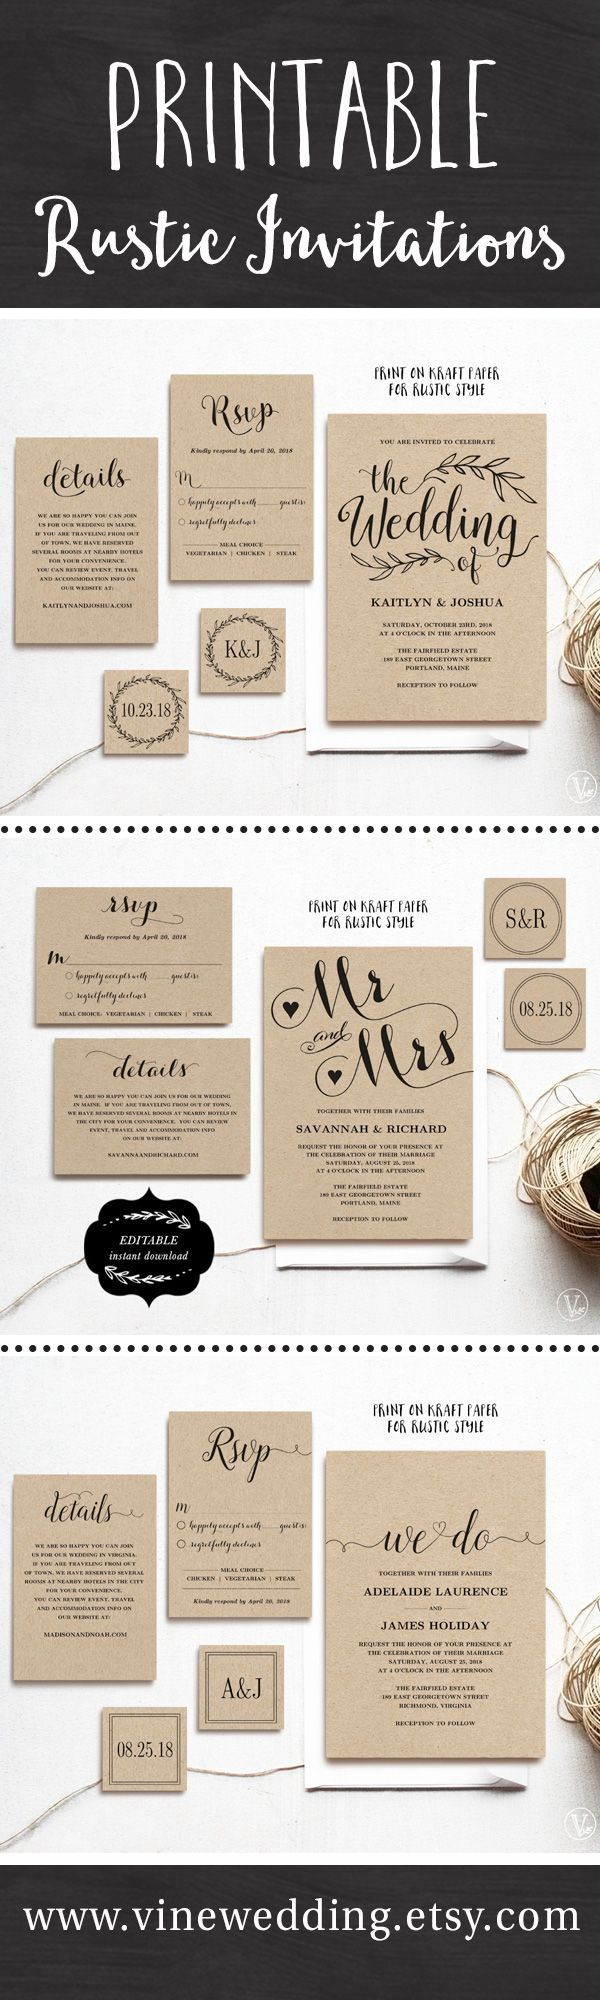 Diy wedding invitations best photos diy wedding invitations craft